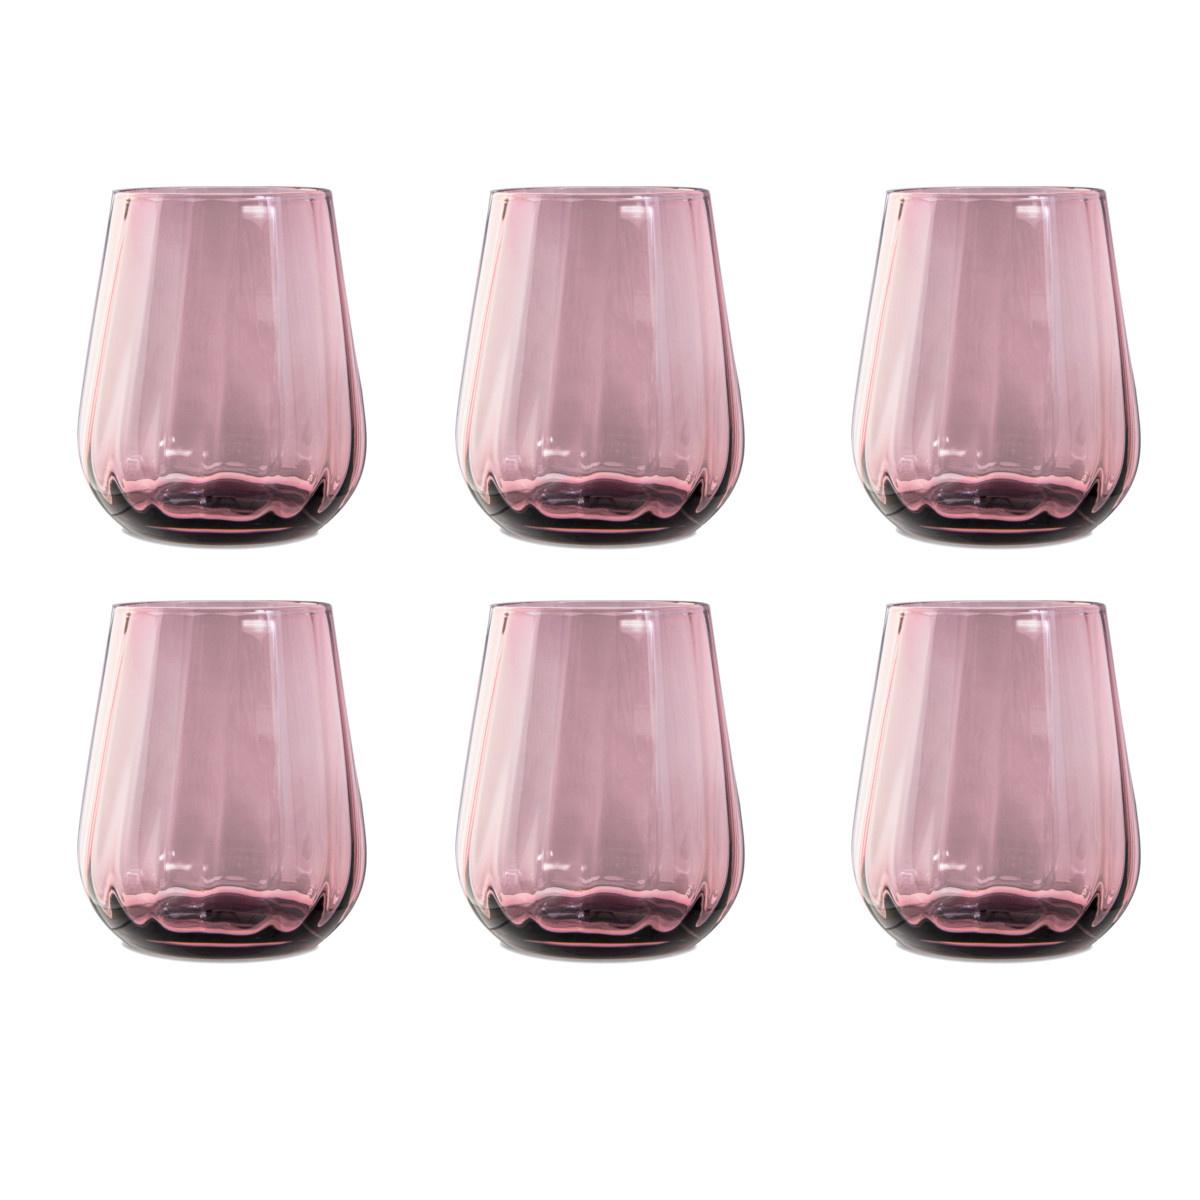 Livellara Livellara RINASCIMENTO  Glas / Tumbler 400 ml – Set van 6 – Kleur: Paars